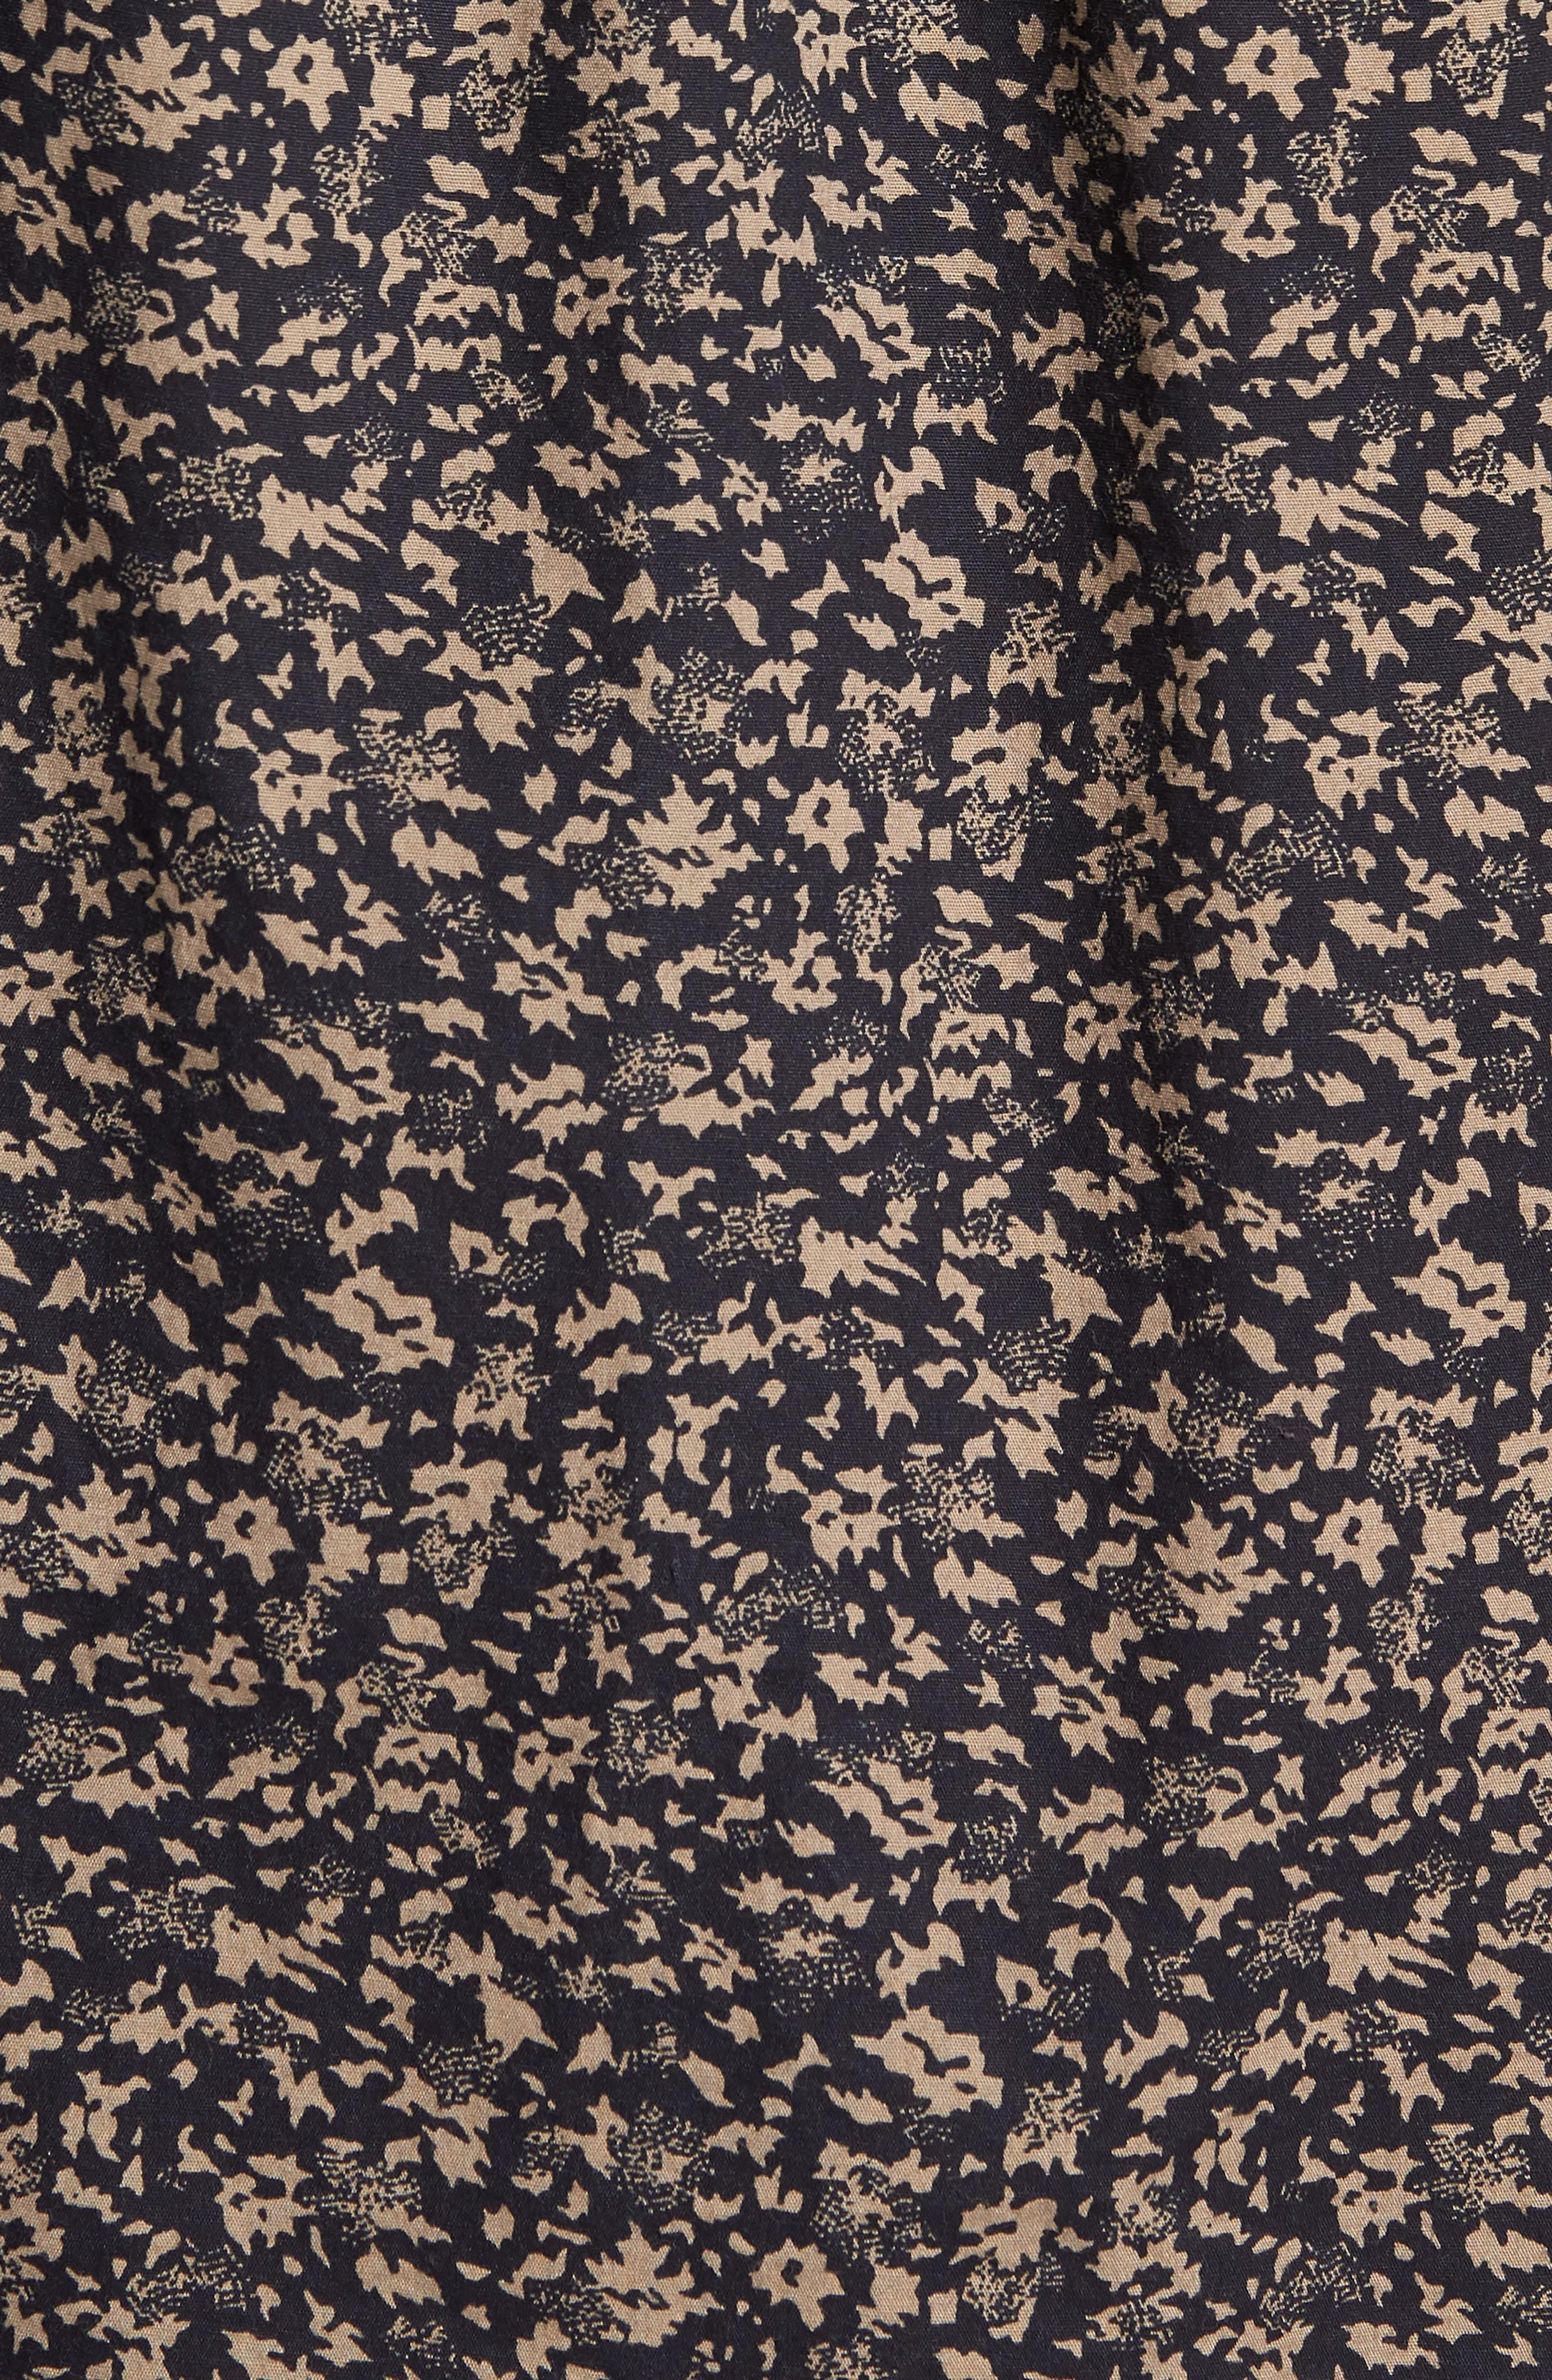 Dresden Woven Shirt,                             Alternate thumbnail 5, color,                             Pirate Black